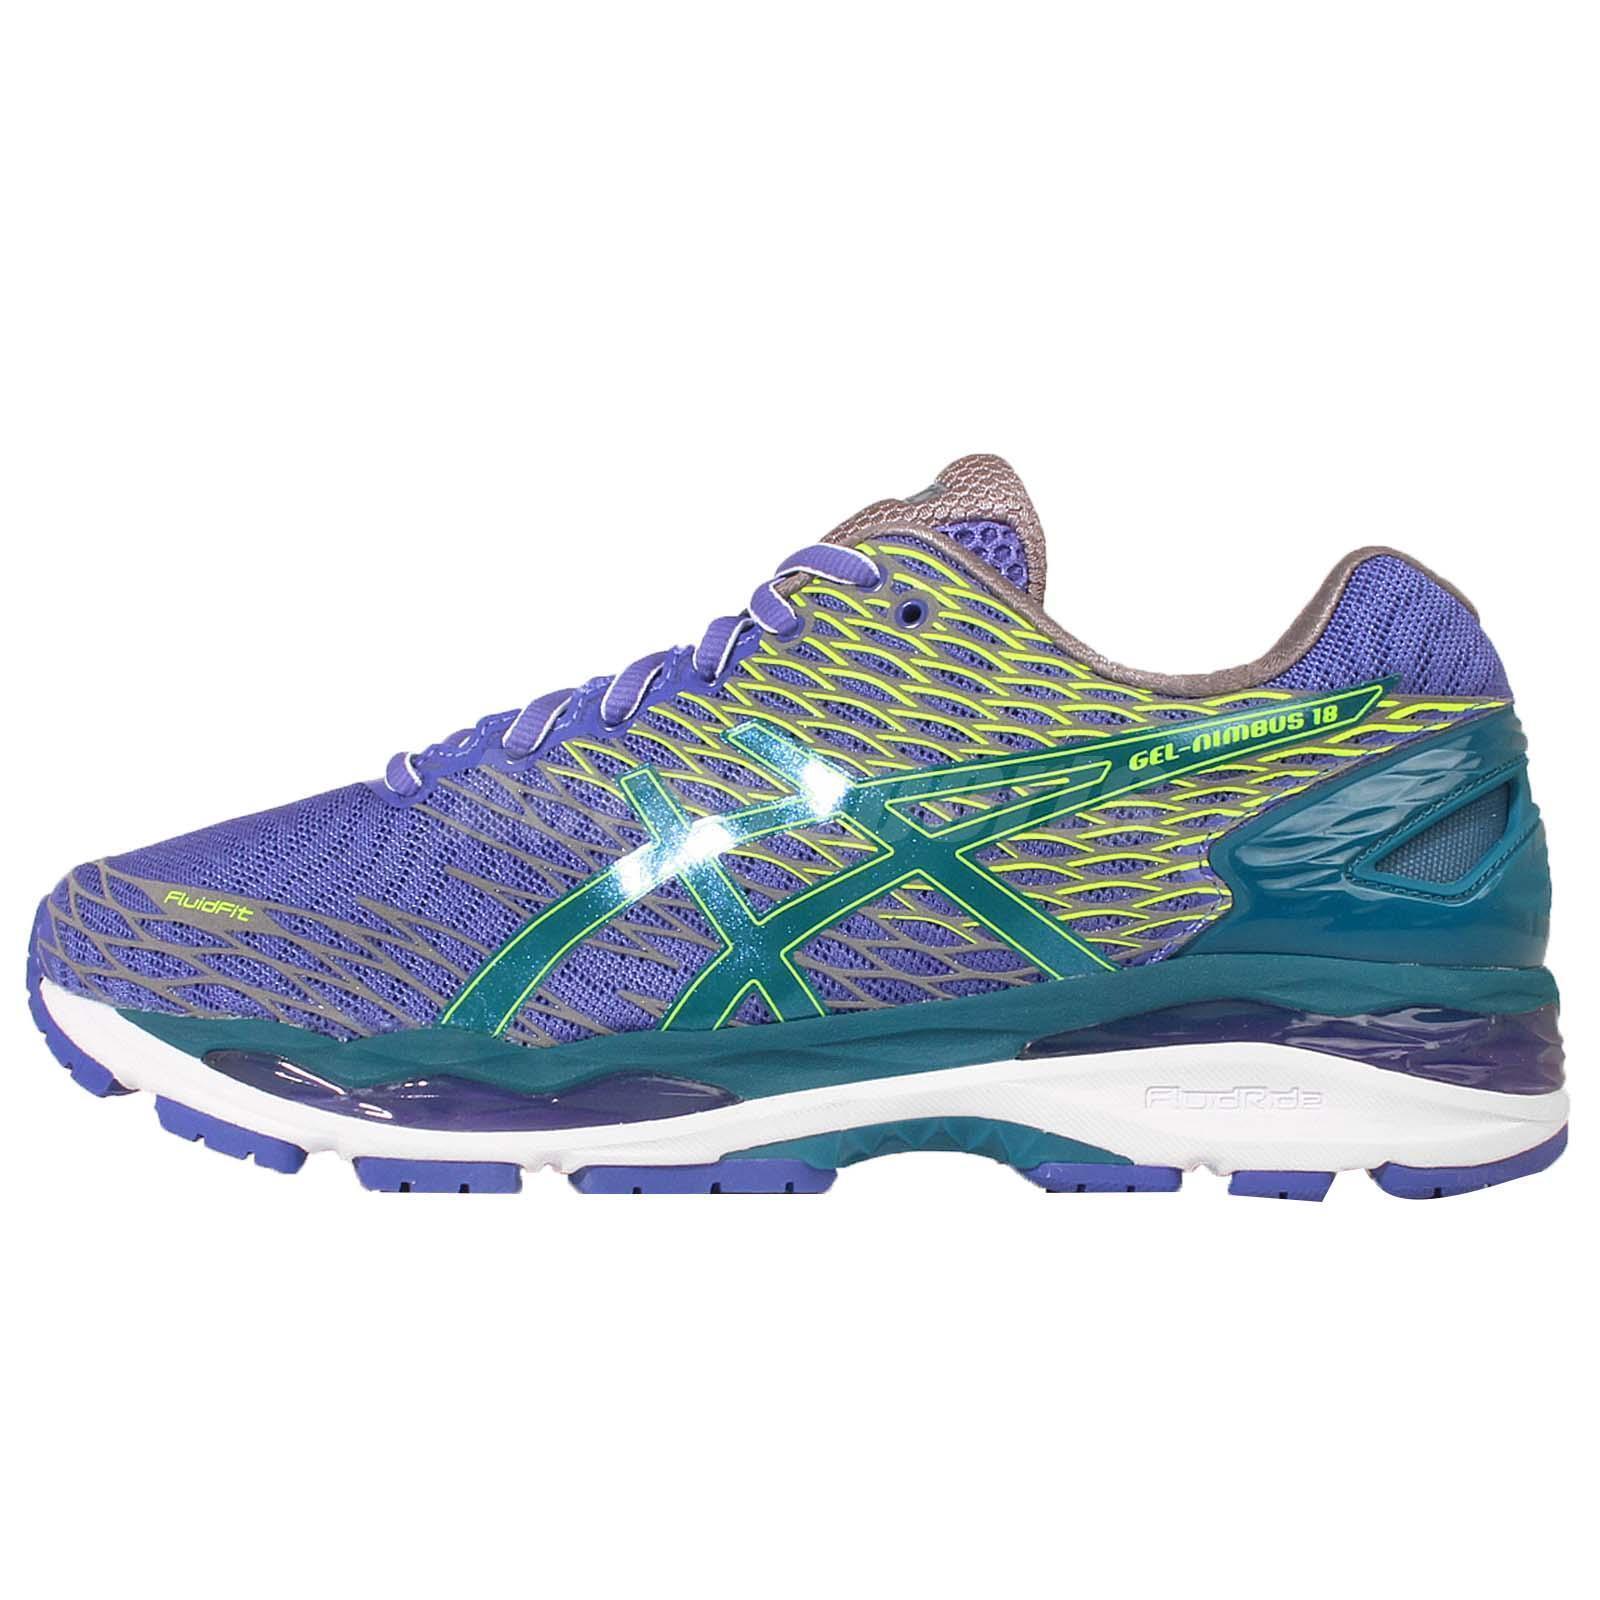 Asics Gel-Nimbus 18 Lite-Show Purple Green Mens Running Trainers T60XQ-5338